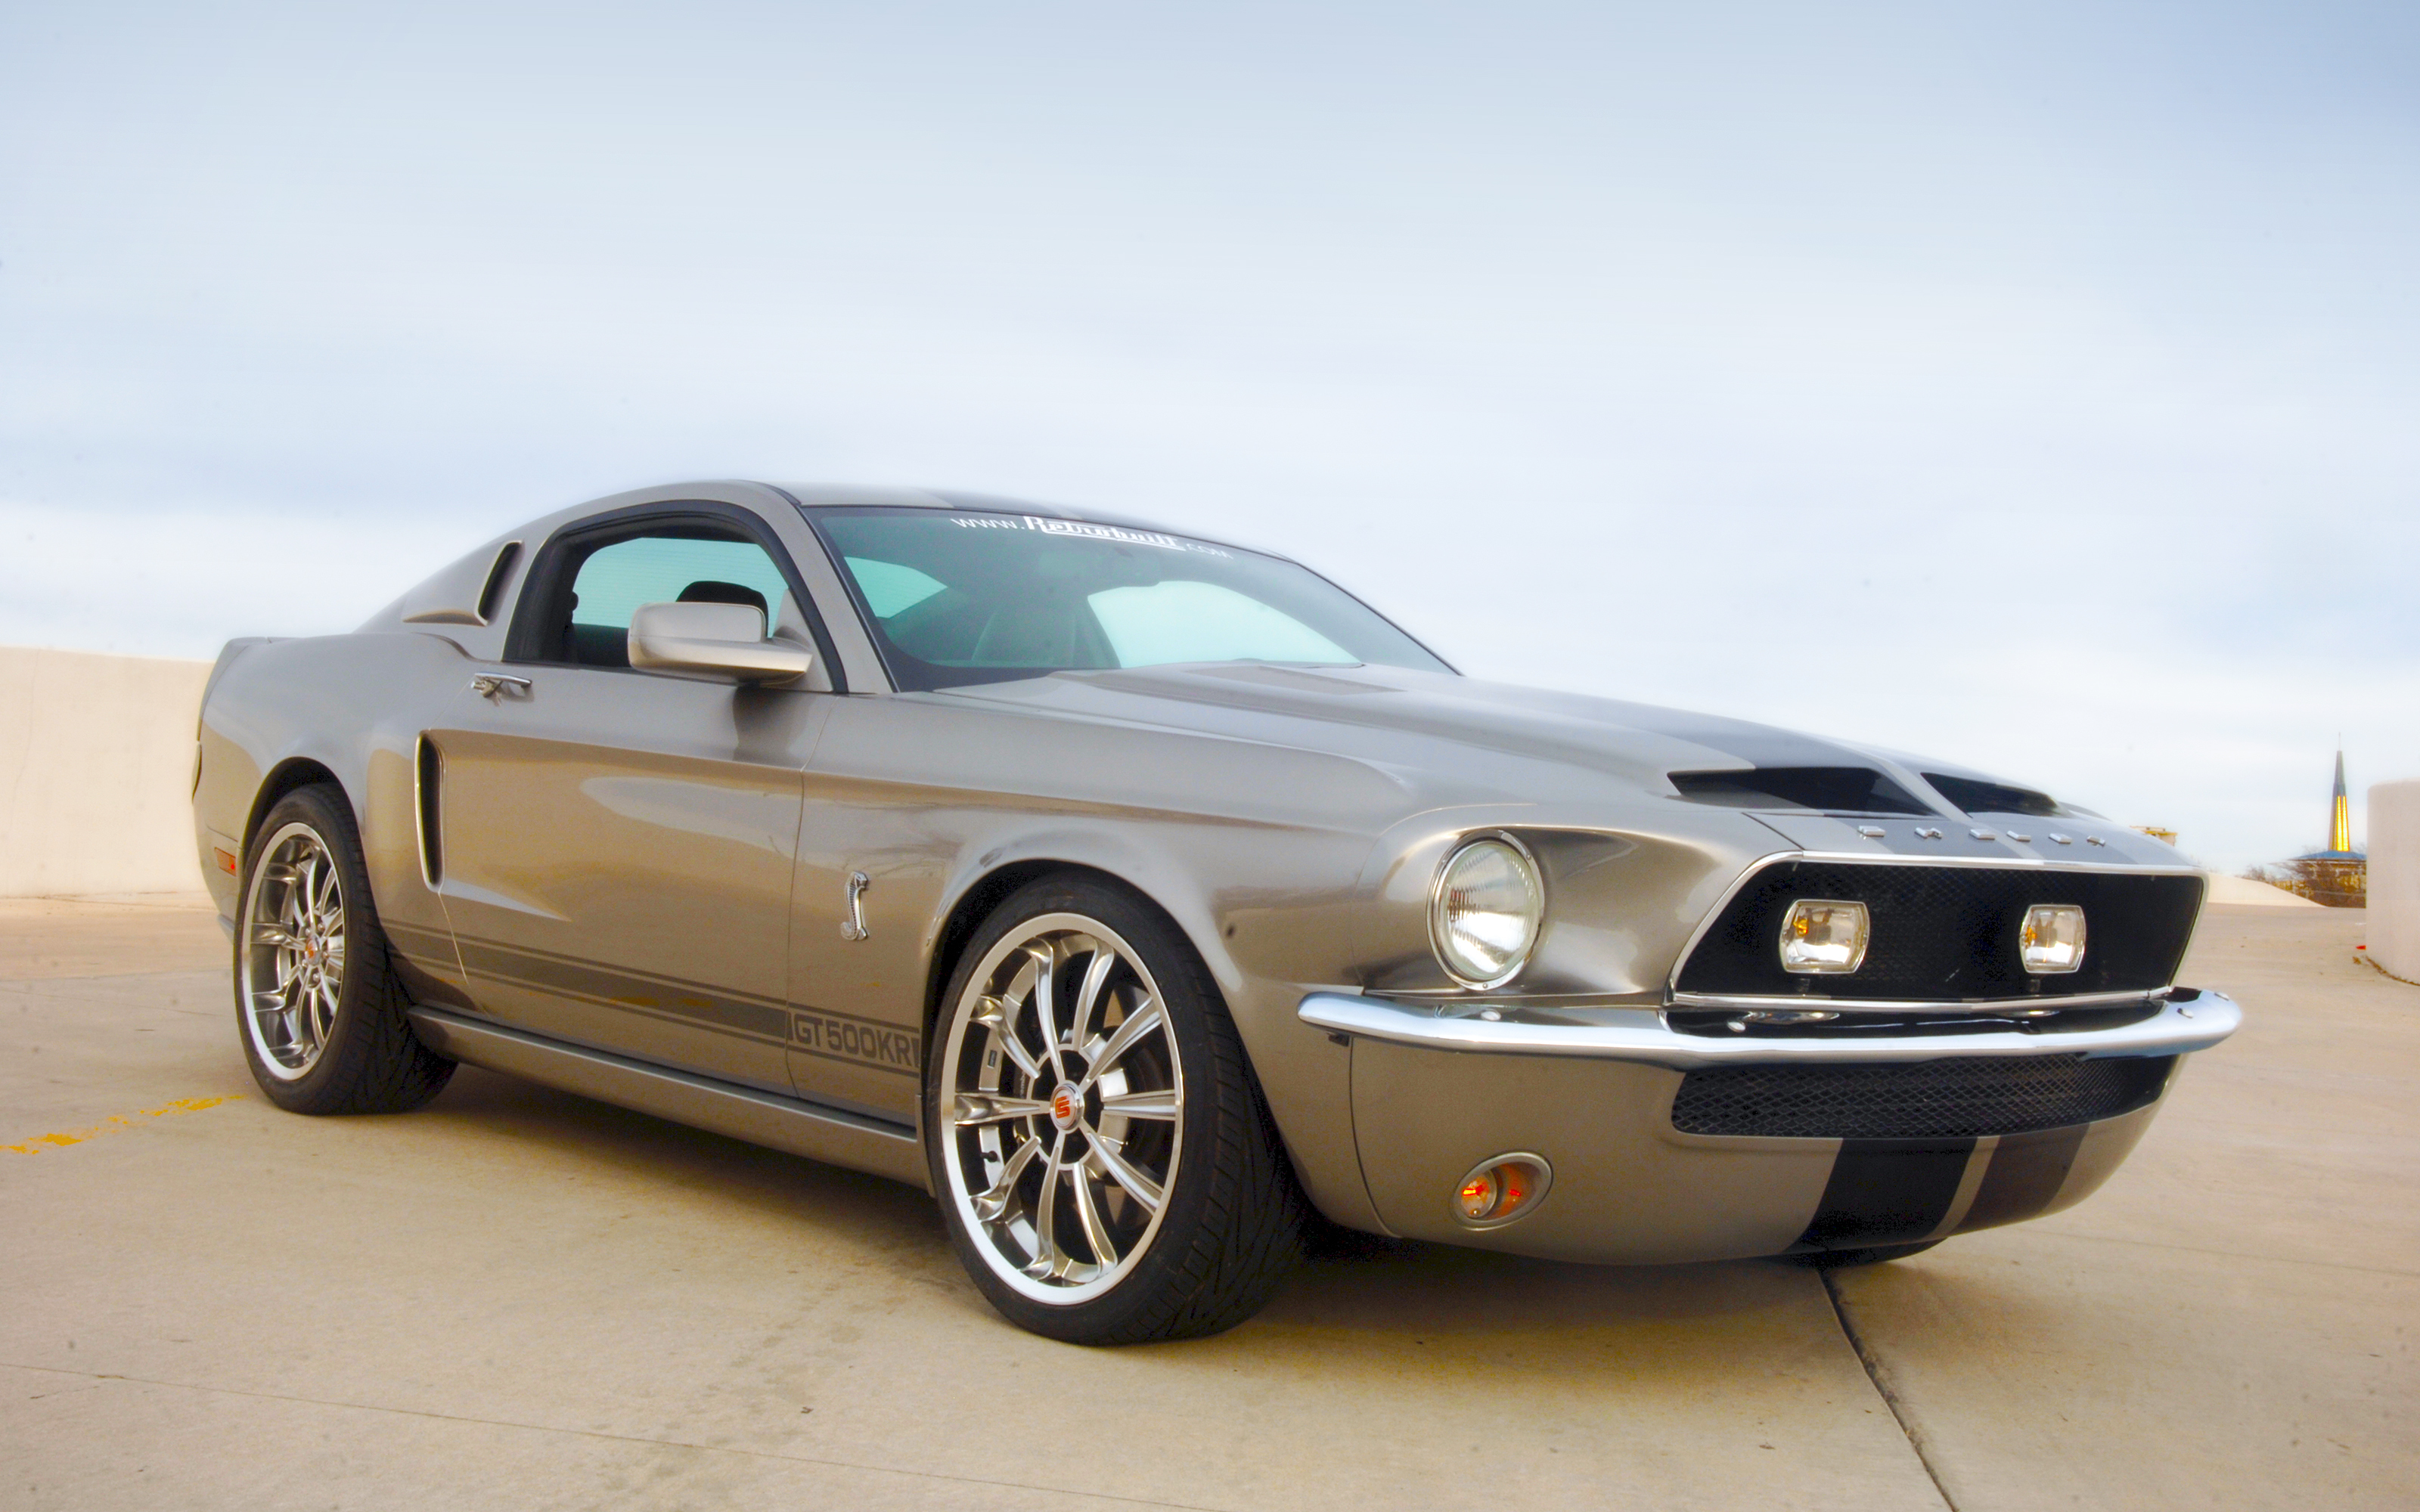 Ford Mustang Shelby Мустанг Шелби скачать